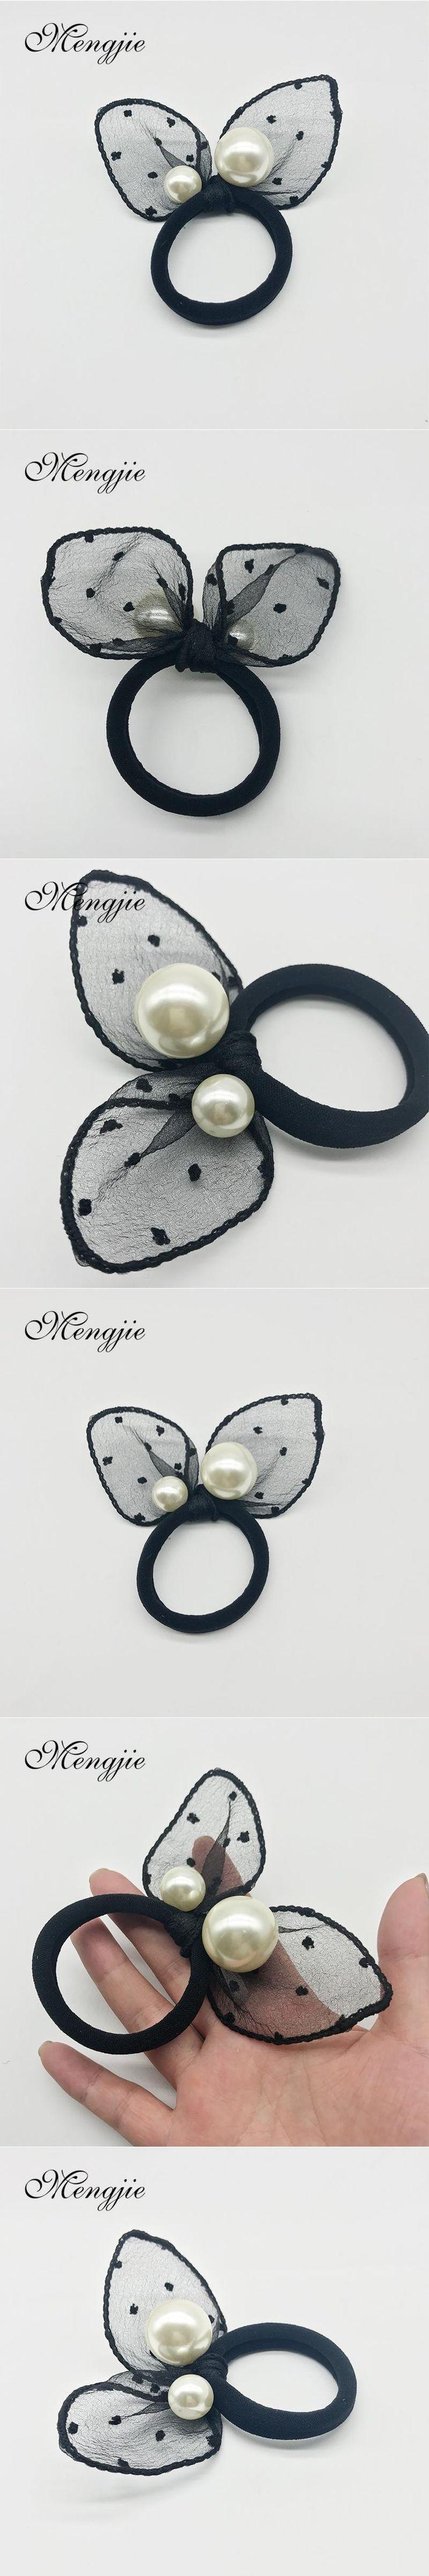 2017 two big imitation pearls girl headbands for women black mesh hairband elastic hair ornaments haar accessoires 8028